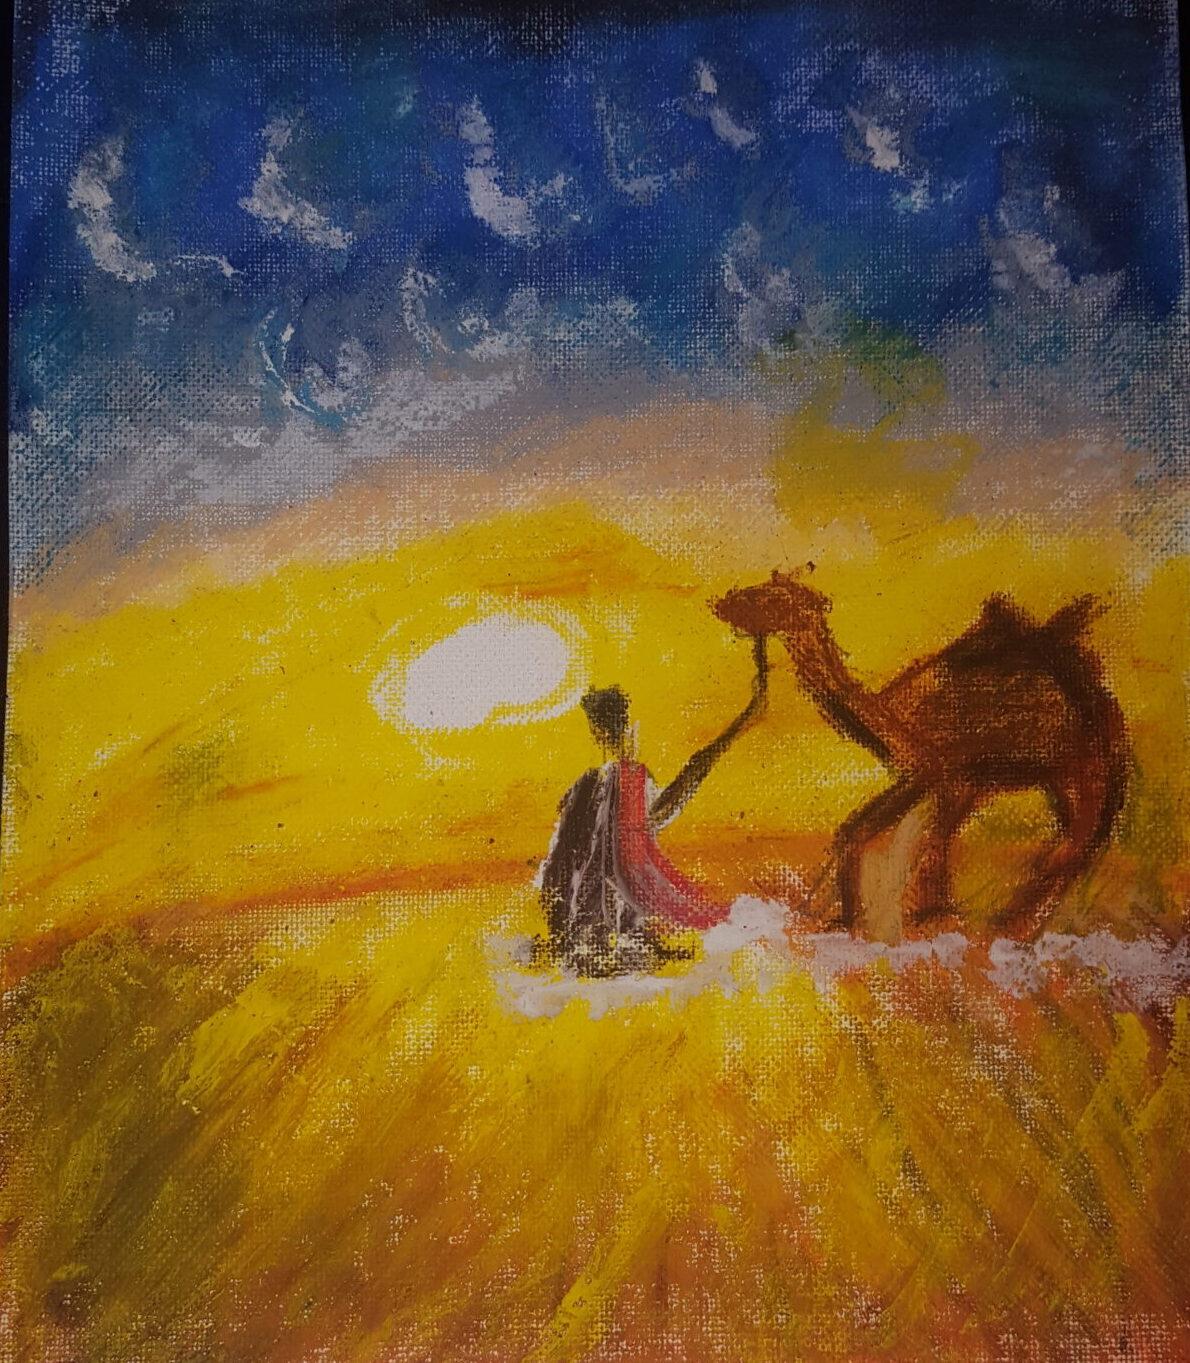 Desert Sunset by Ahmad Samir